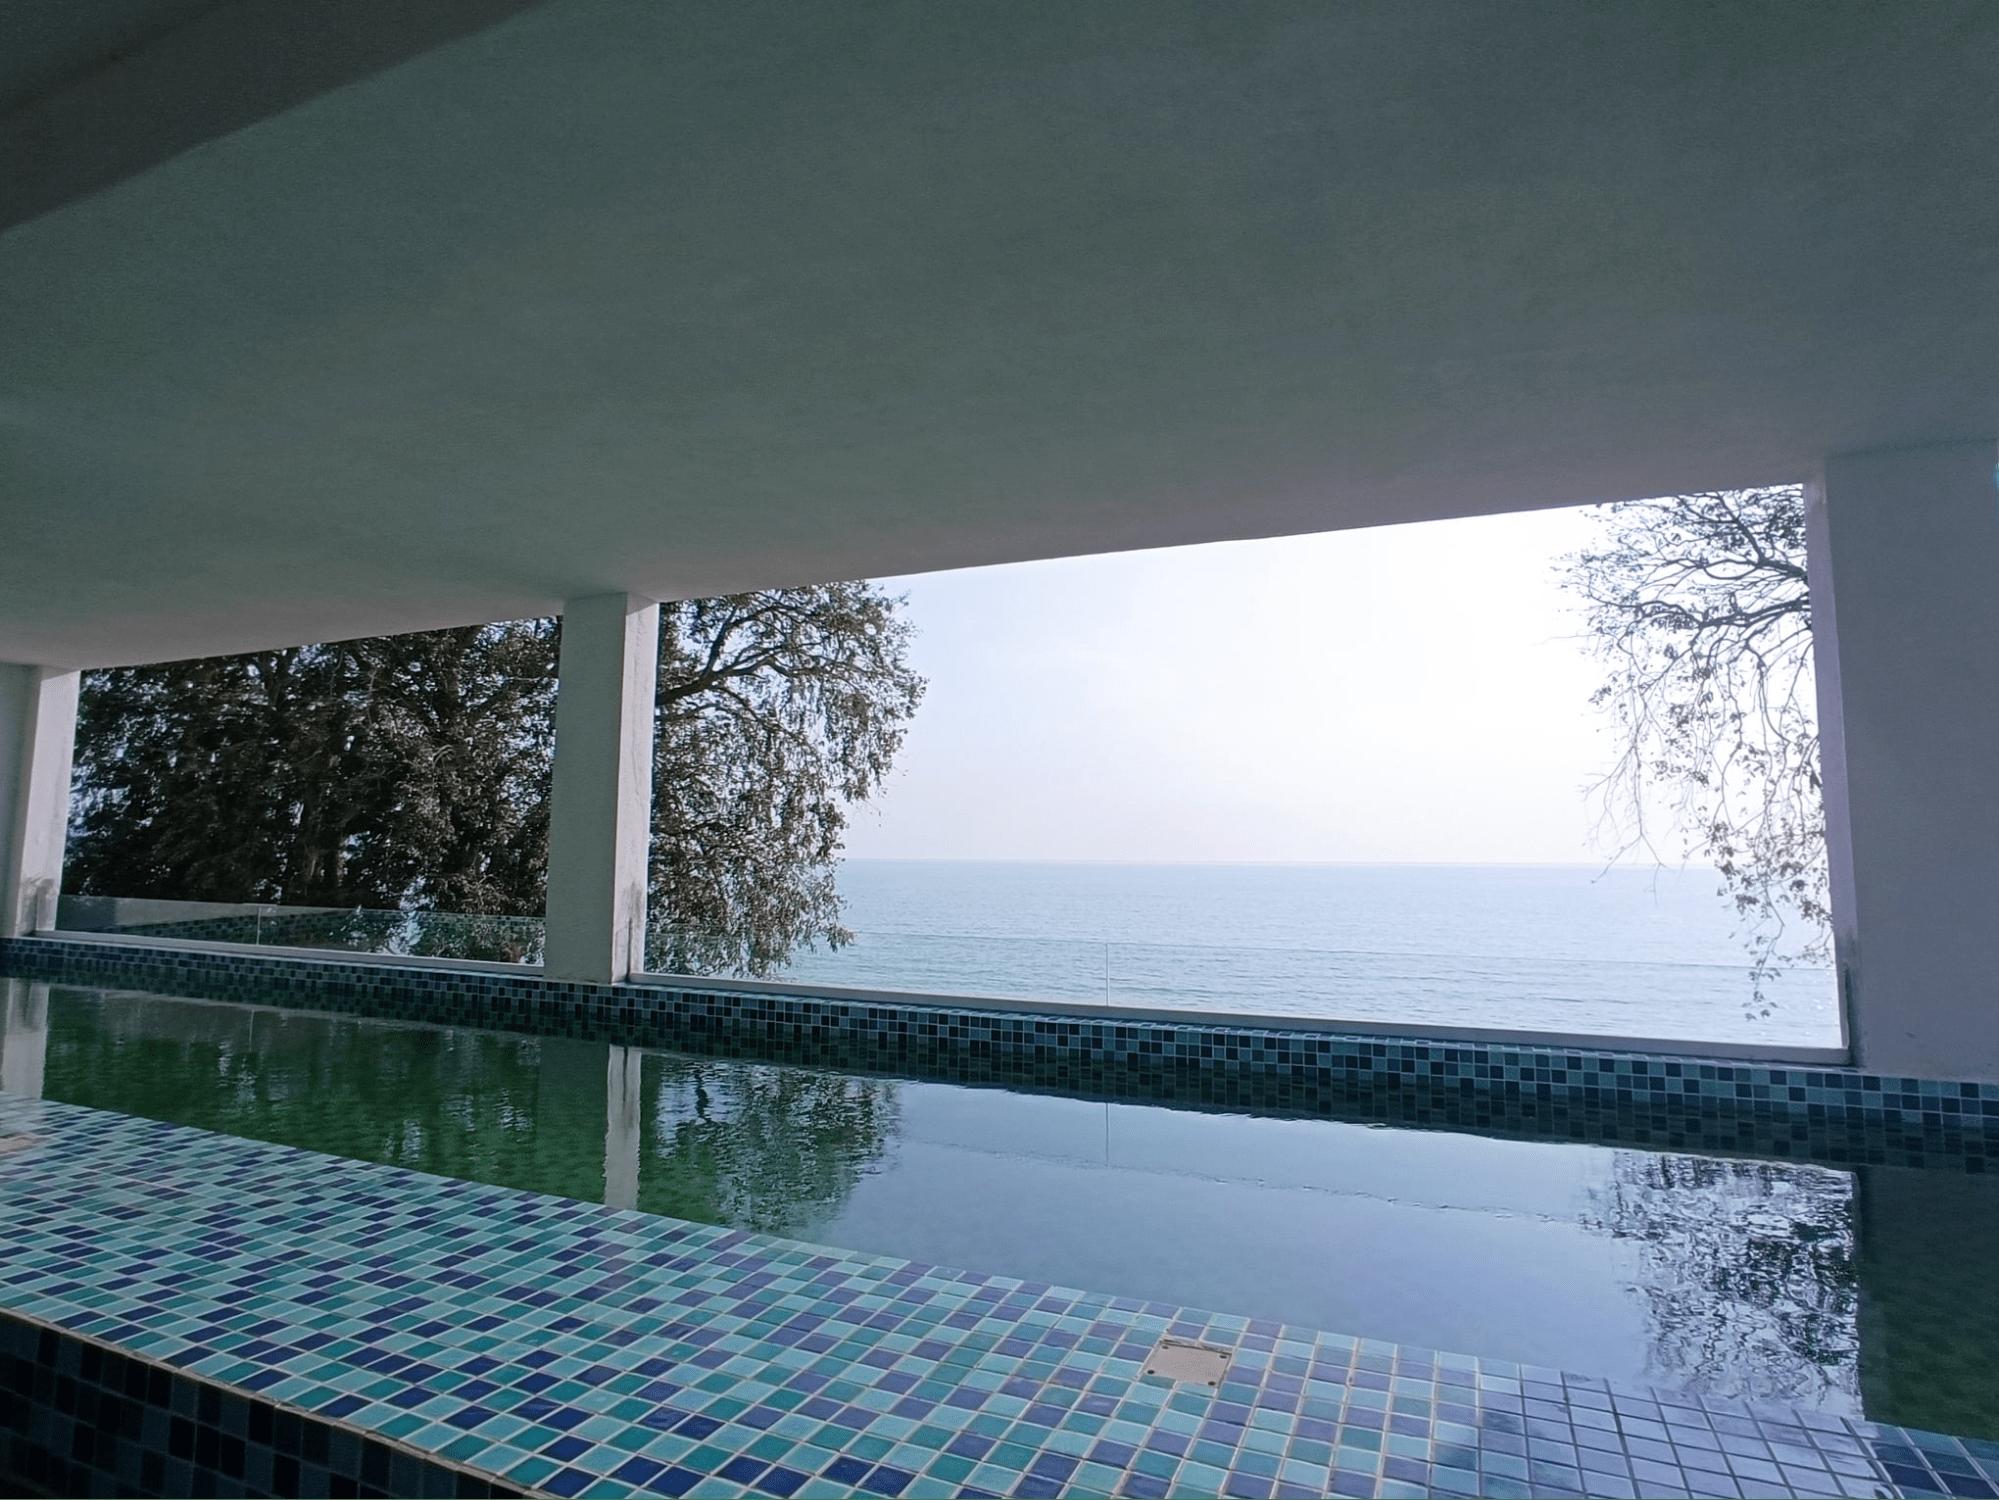 Pacific Regency Beach Resort In Port Dickson - private pool